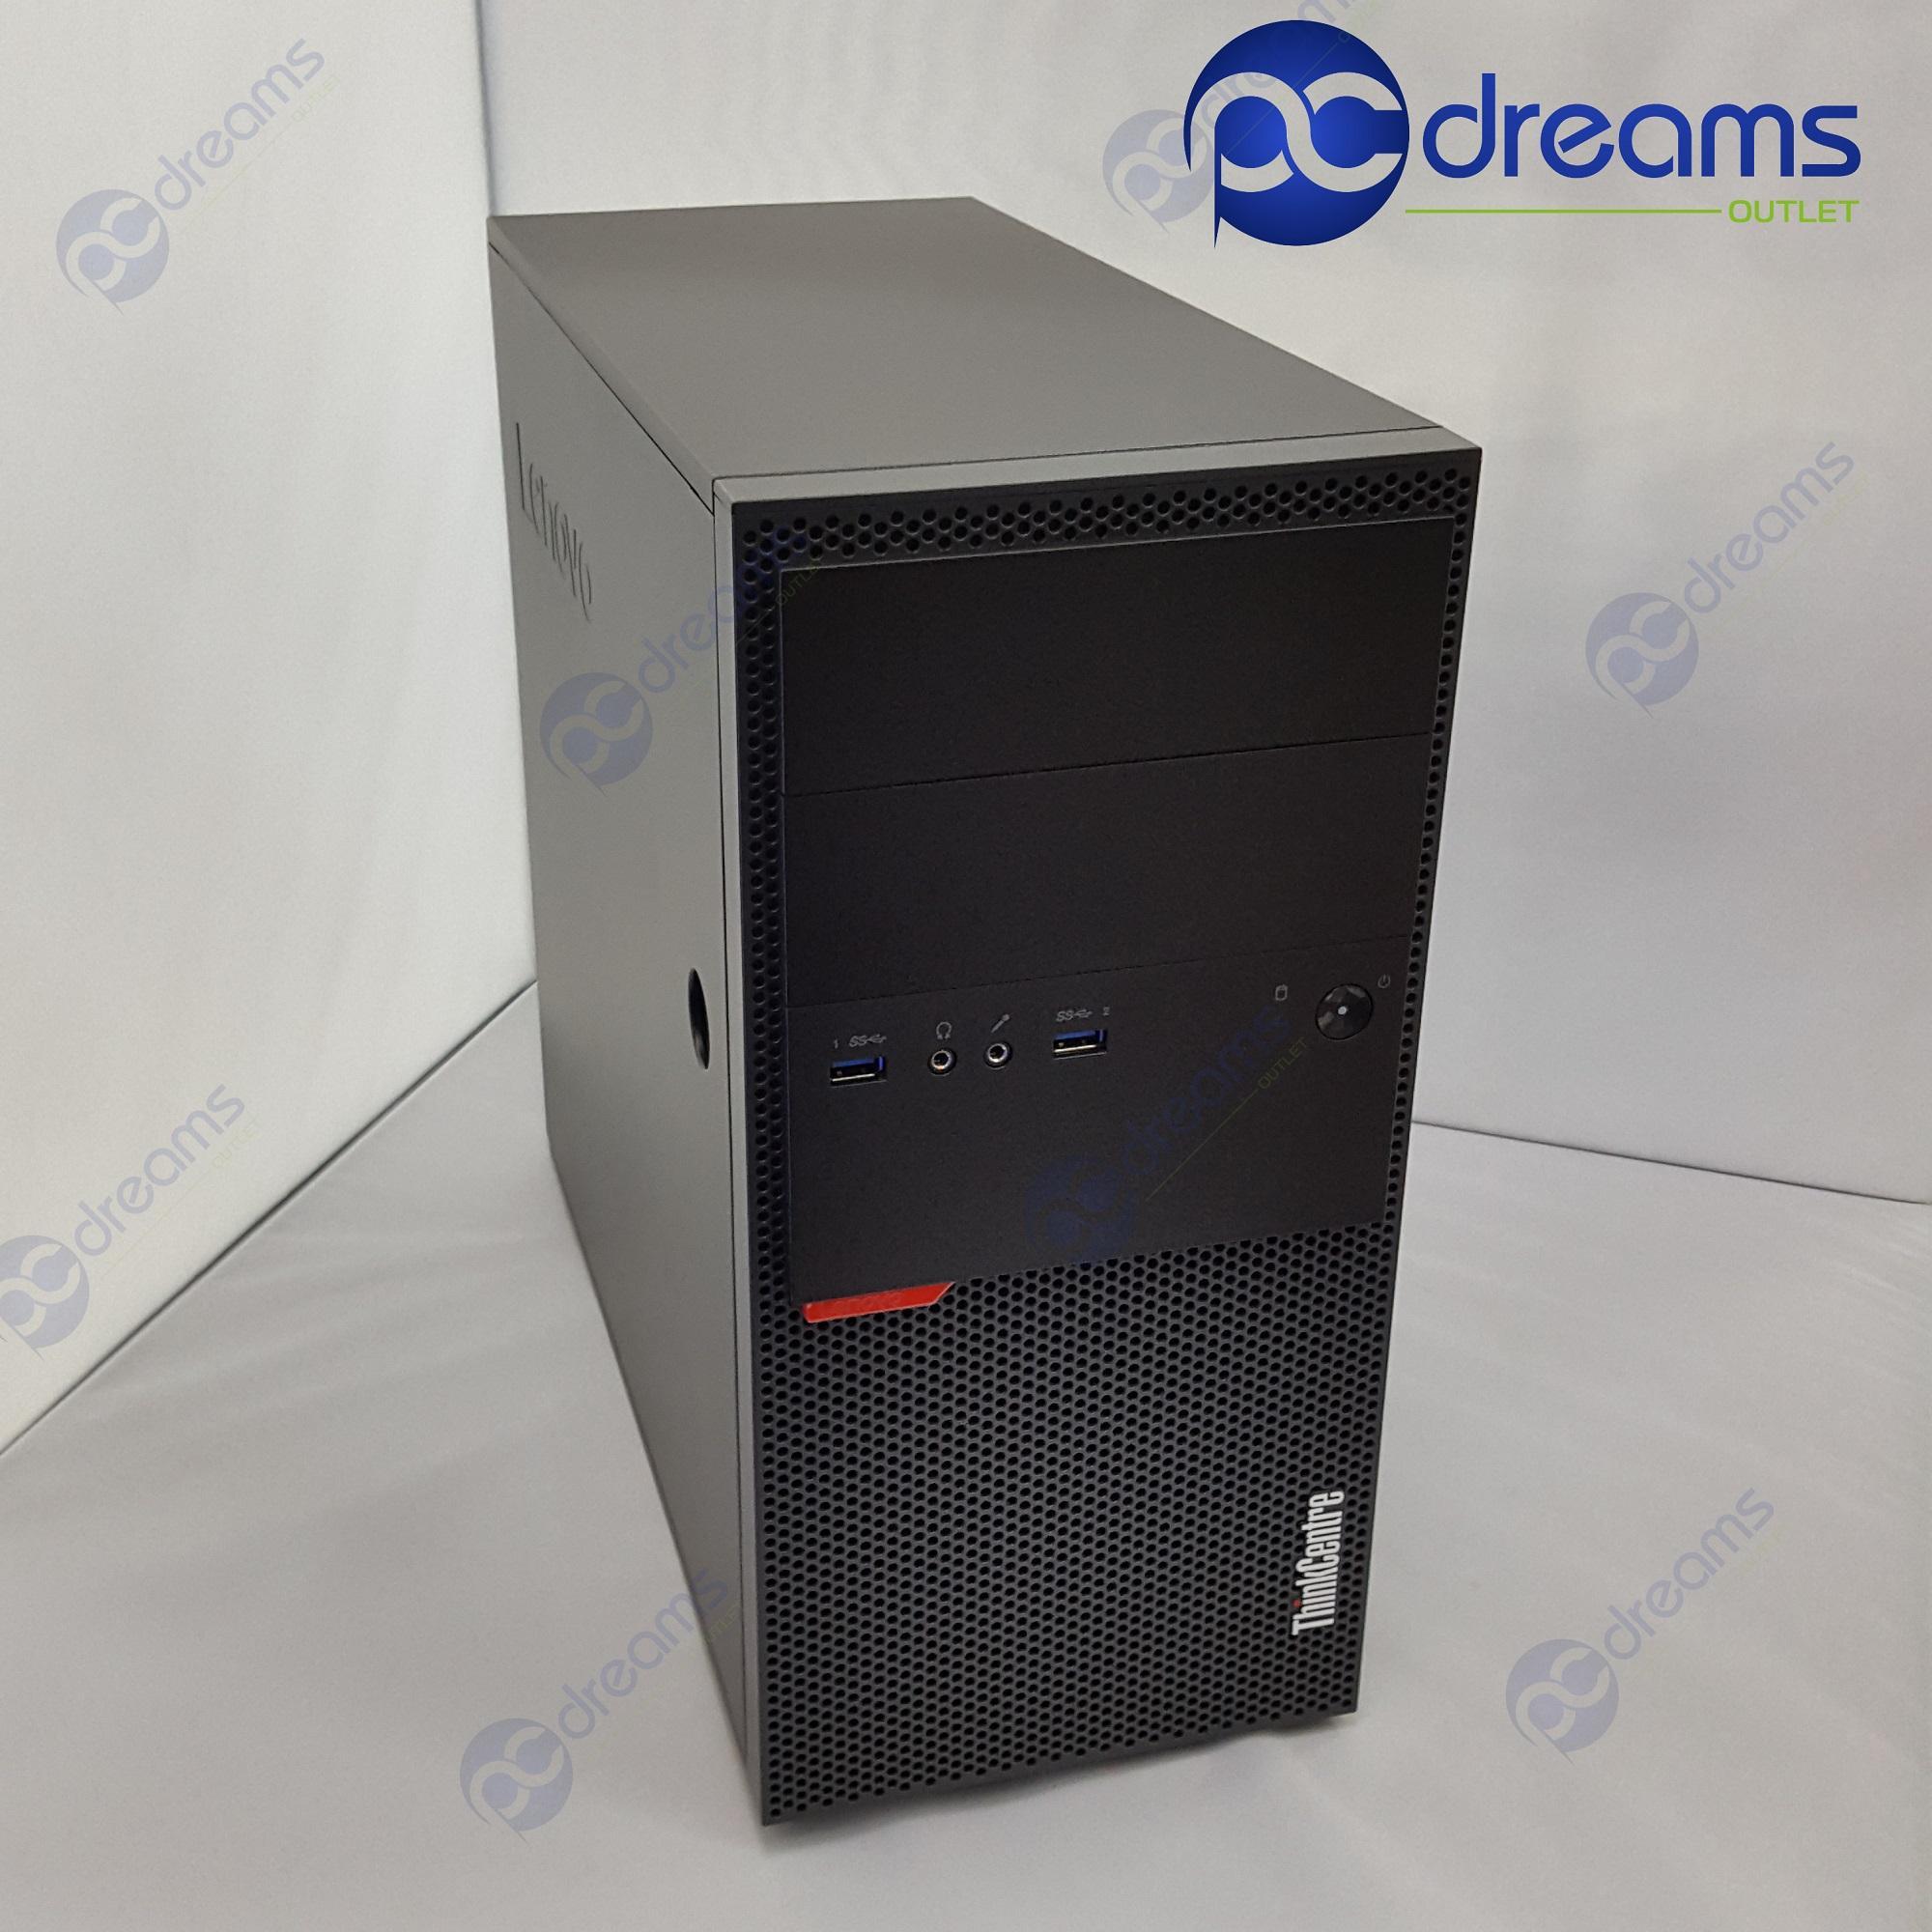 BEST LOBANG! LENOVO THINKCENTRE M800 MT i3-6100/4GB/500GBHDD [Brand New]